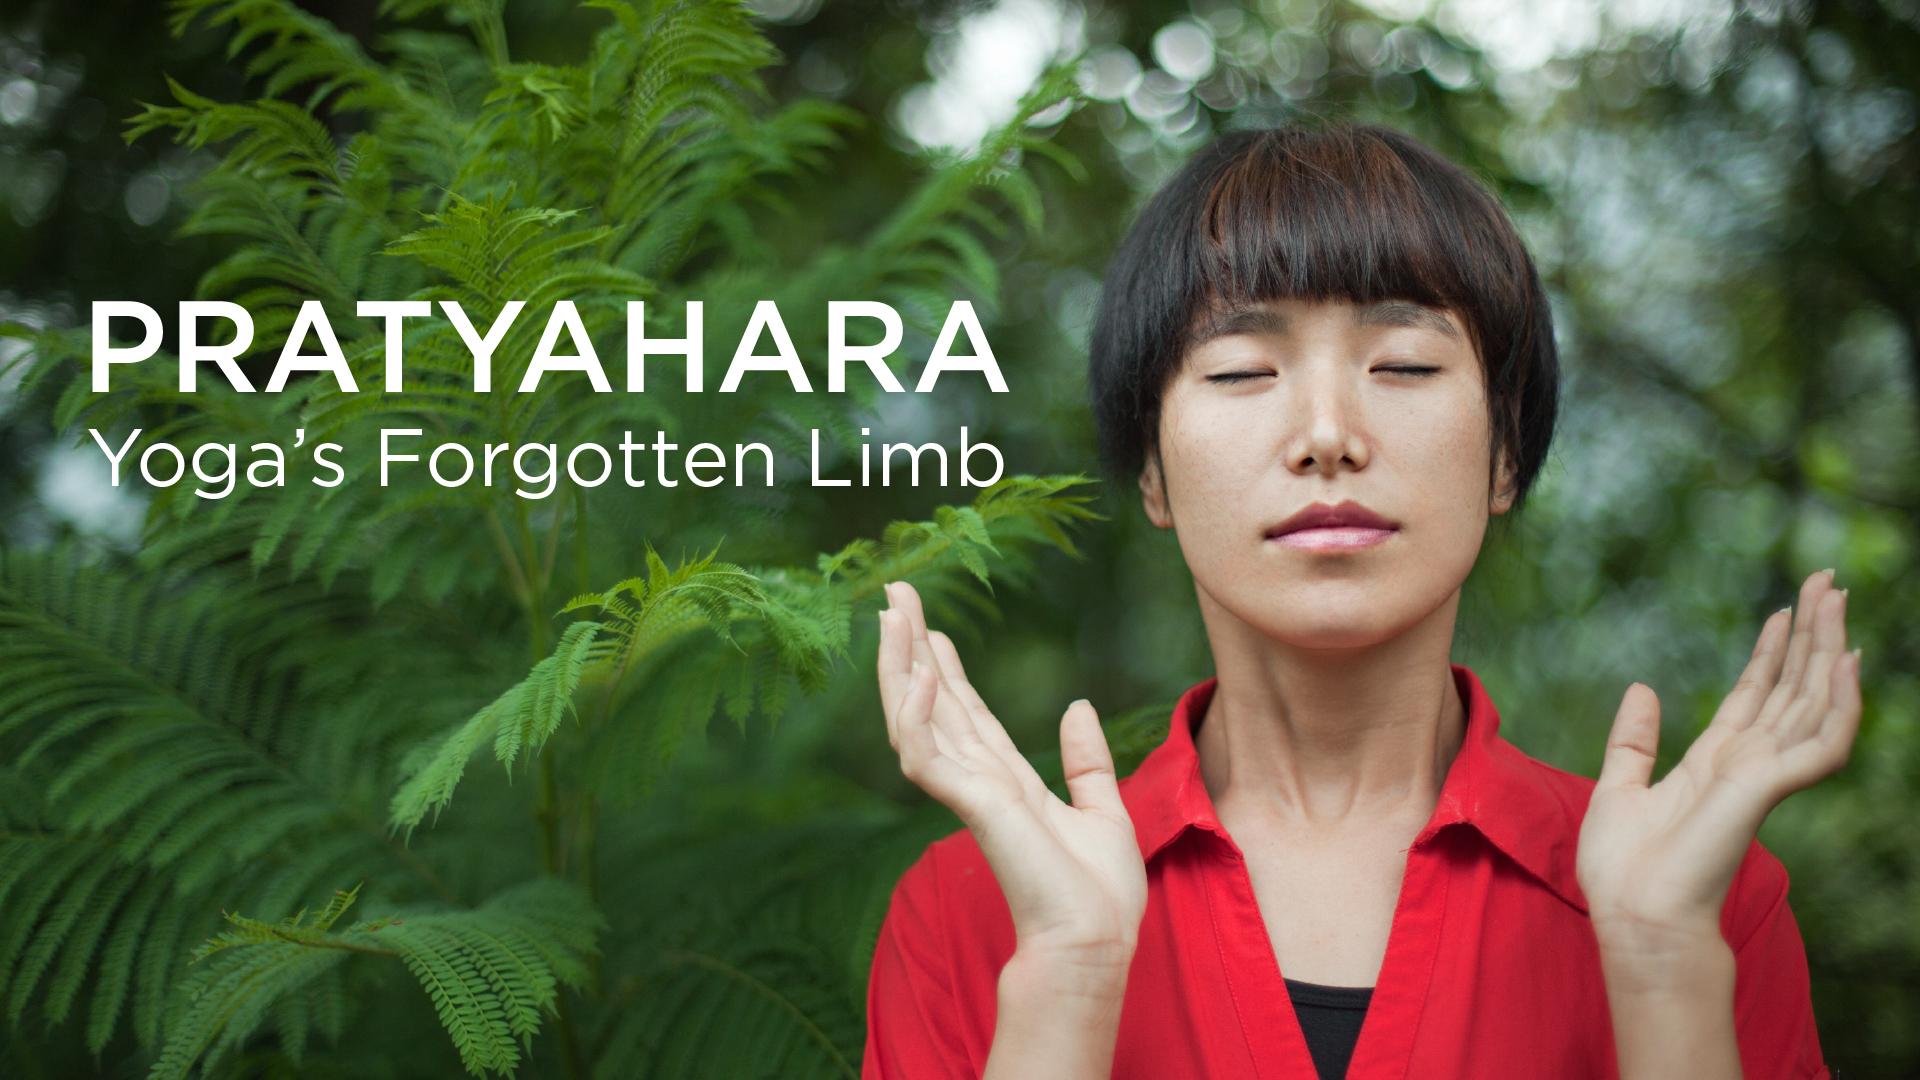 Pratyahara Yogas Forgotten Limb